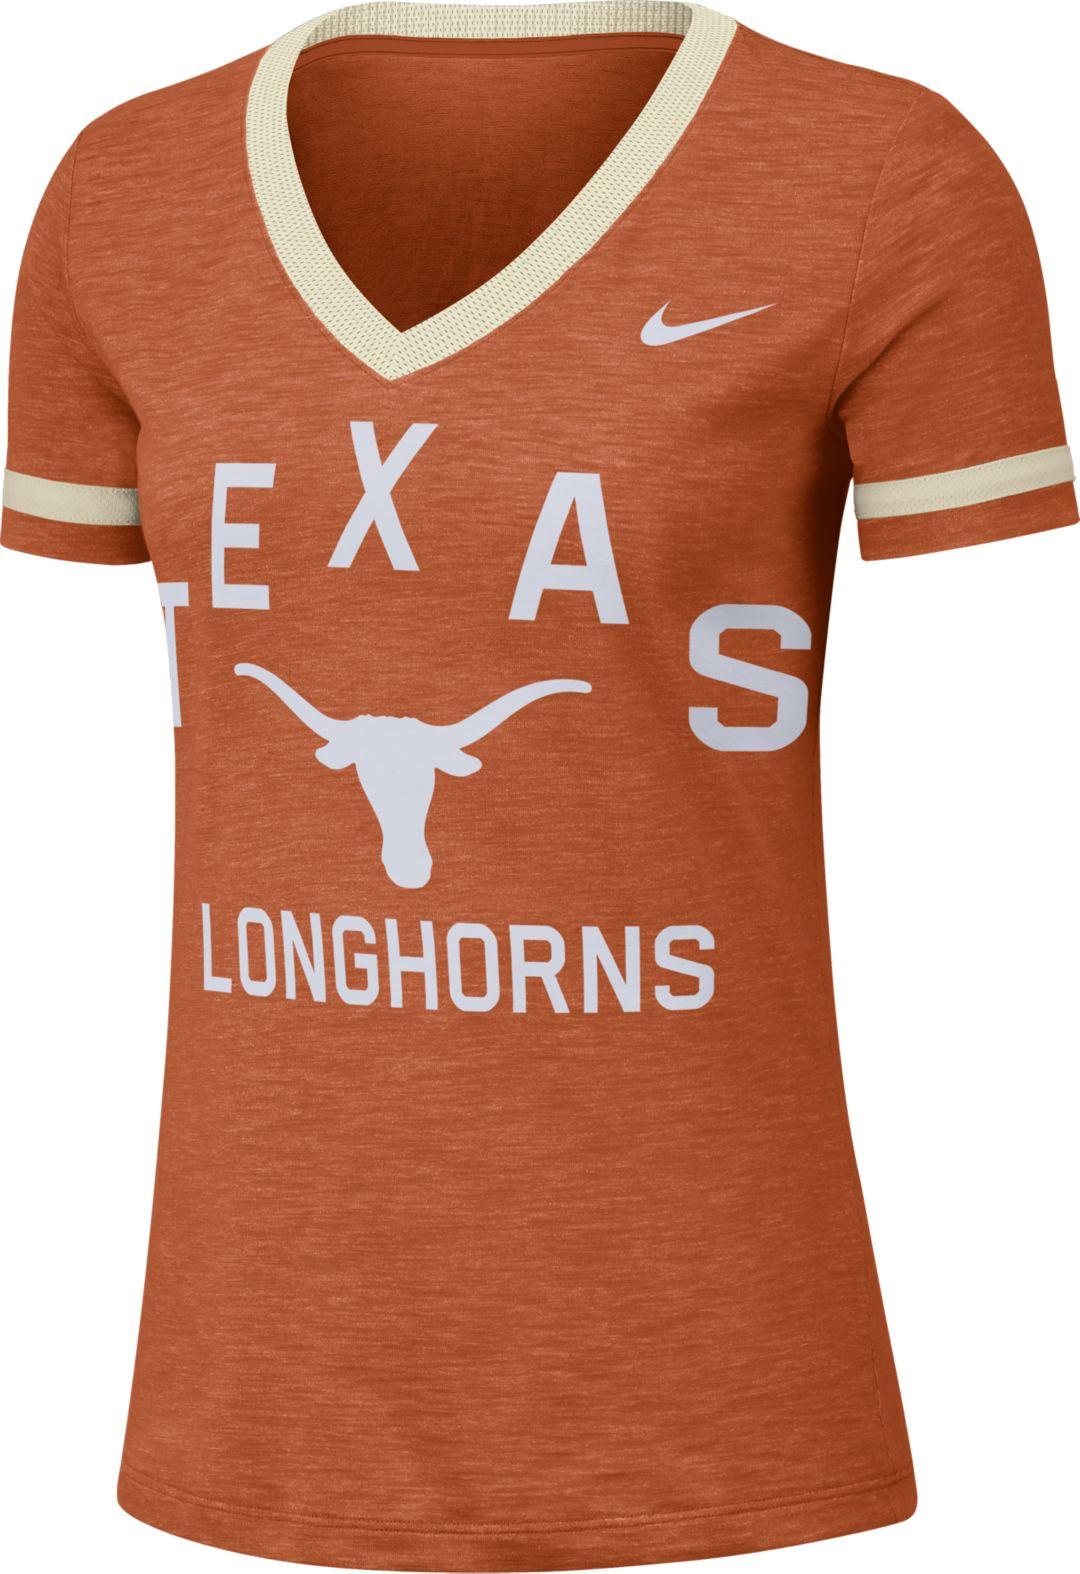 4fd29079 Nike Women's Texas Longhorns Burnt Orange Slub Fan V-Neck T-Shirt